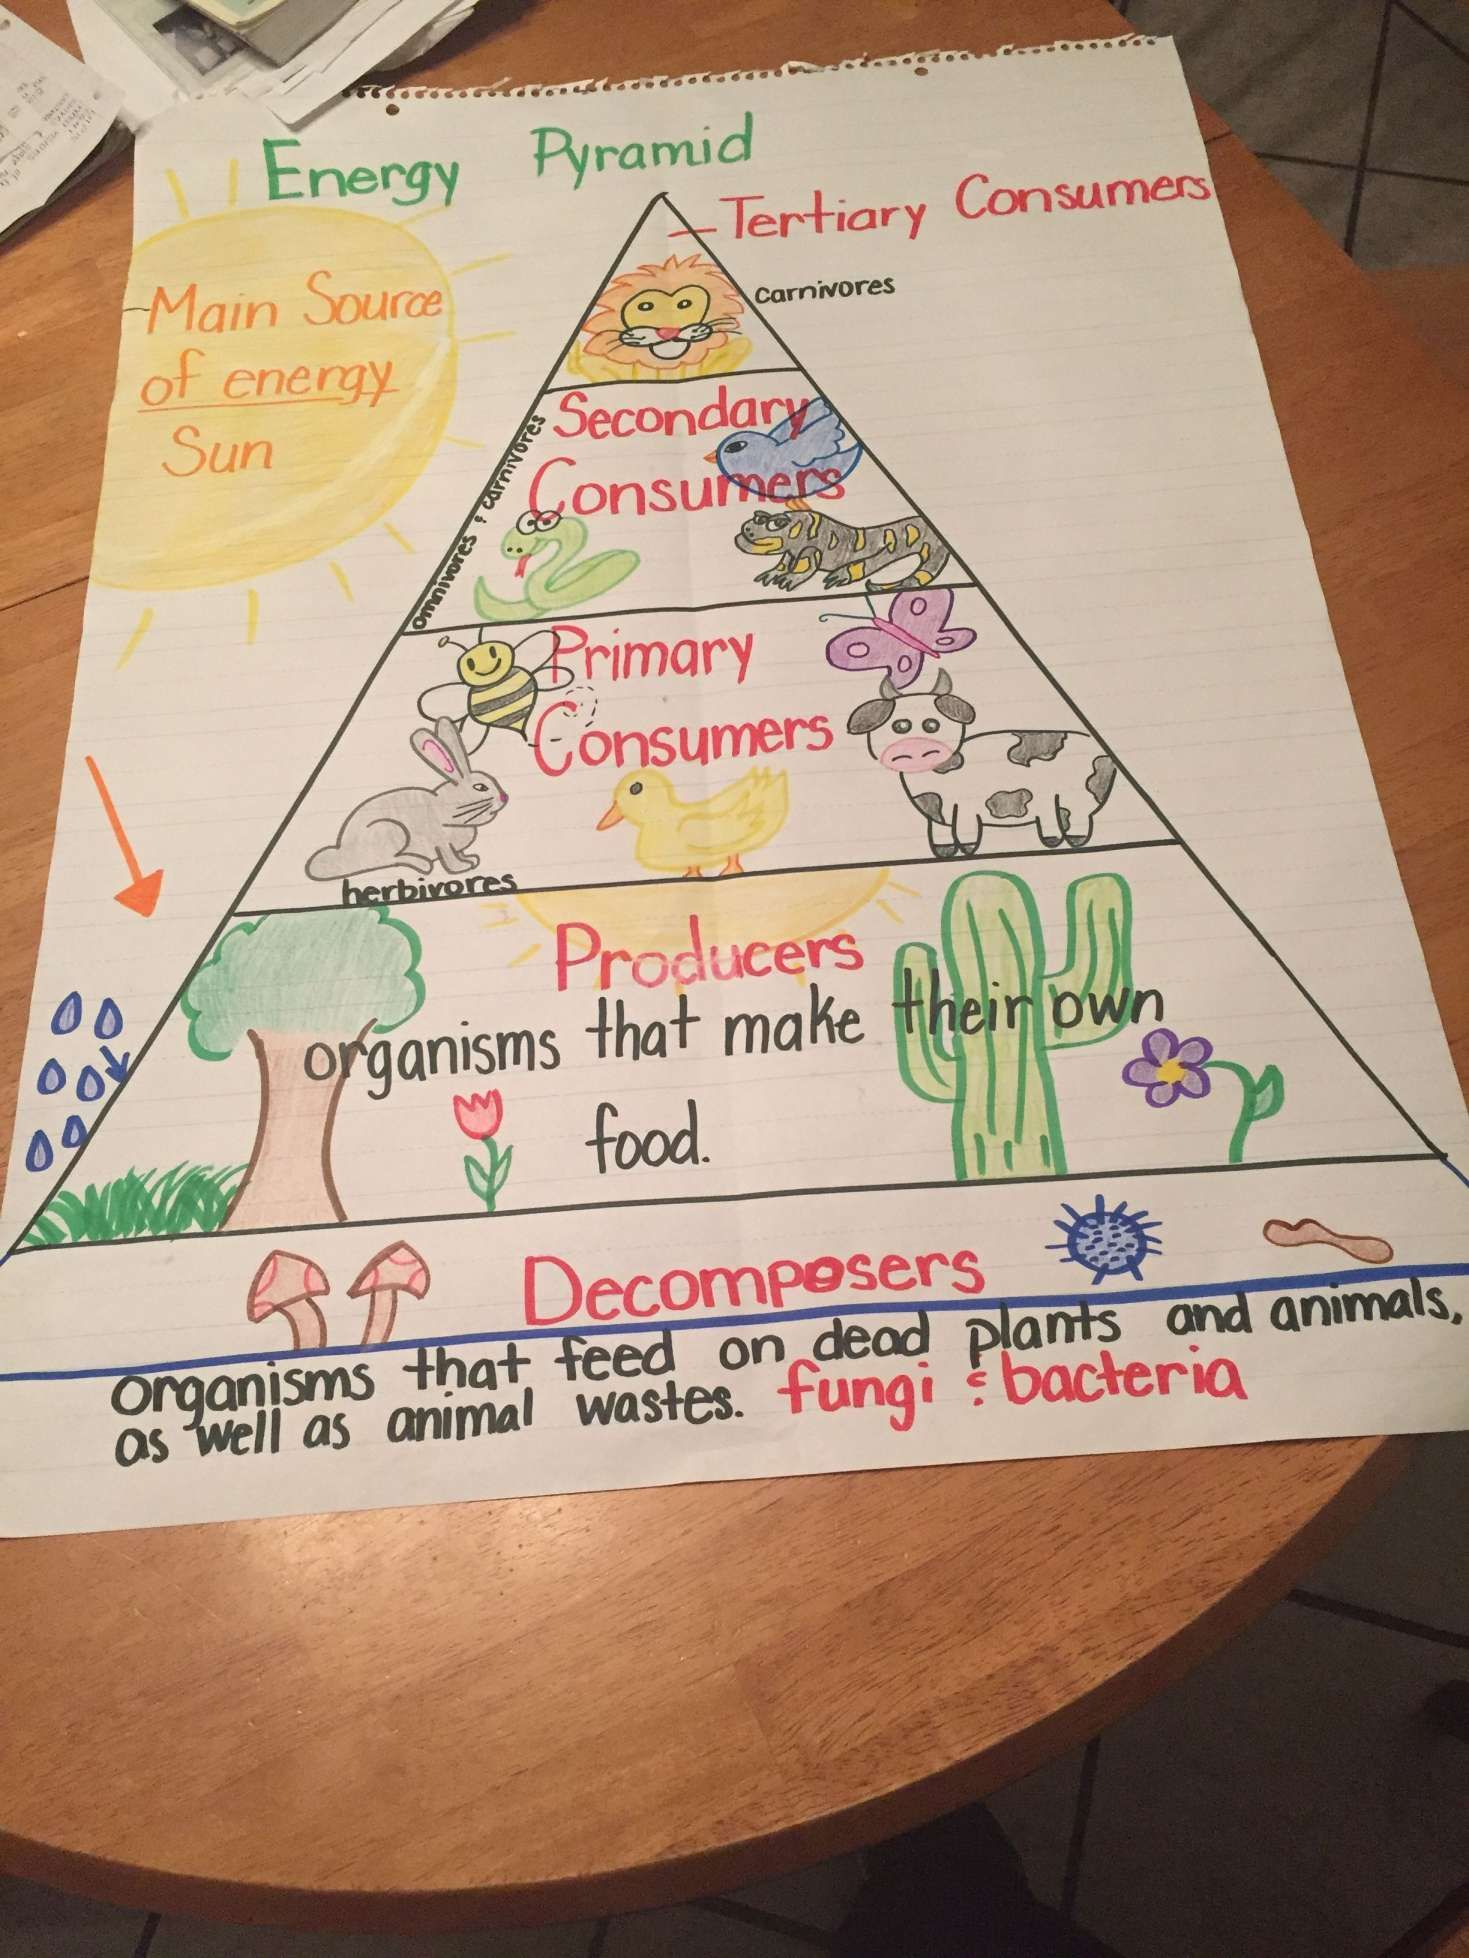 15 Energy Pyramid Worksheet 4th Grade Elementary Science 5th Grade Science Teaching Energy